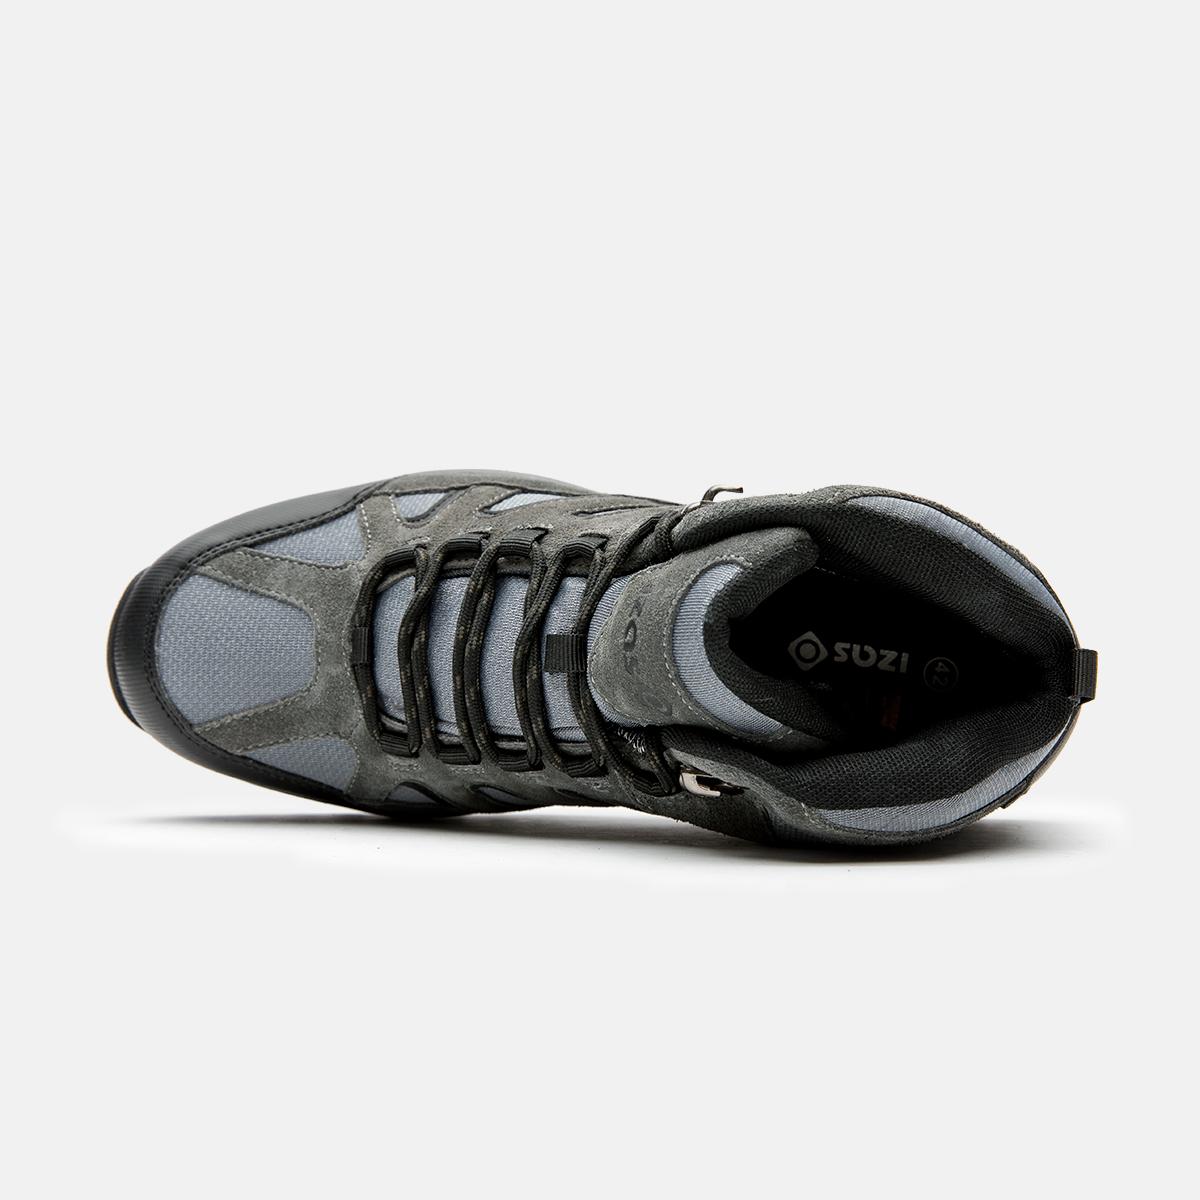 UNISEX'S TIMPA HIKING BOOTS BLACK